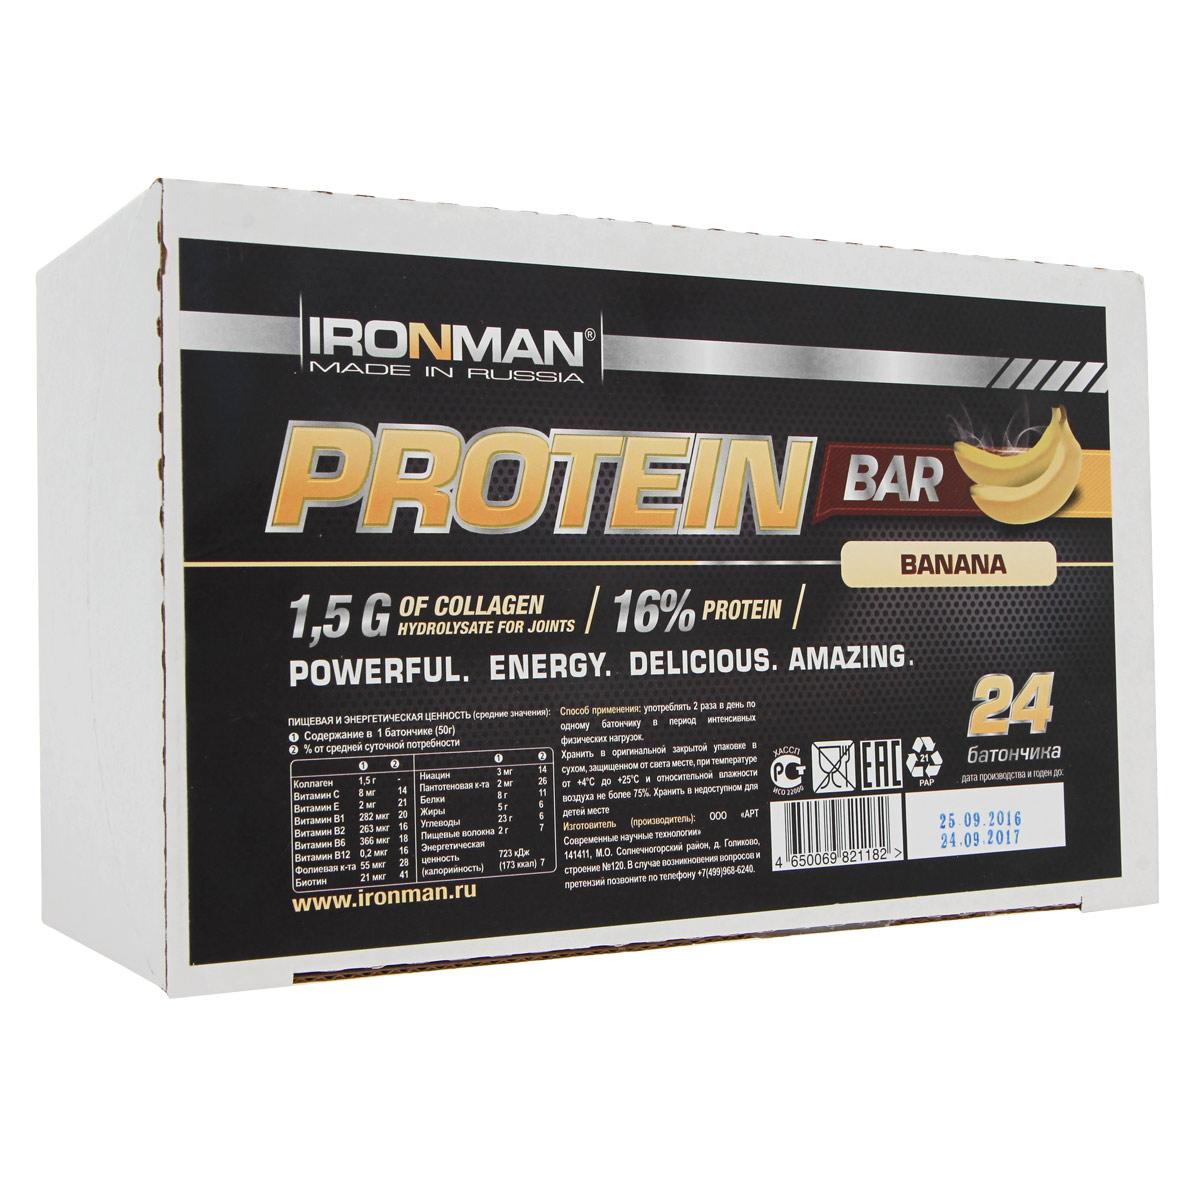 Батончик энергетический Ironman Protein Bar, с коллагеном, банан, темная глазурь, 50 г х 24 шт ironman коллаген в екатеринбурге